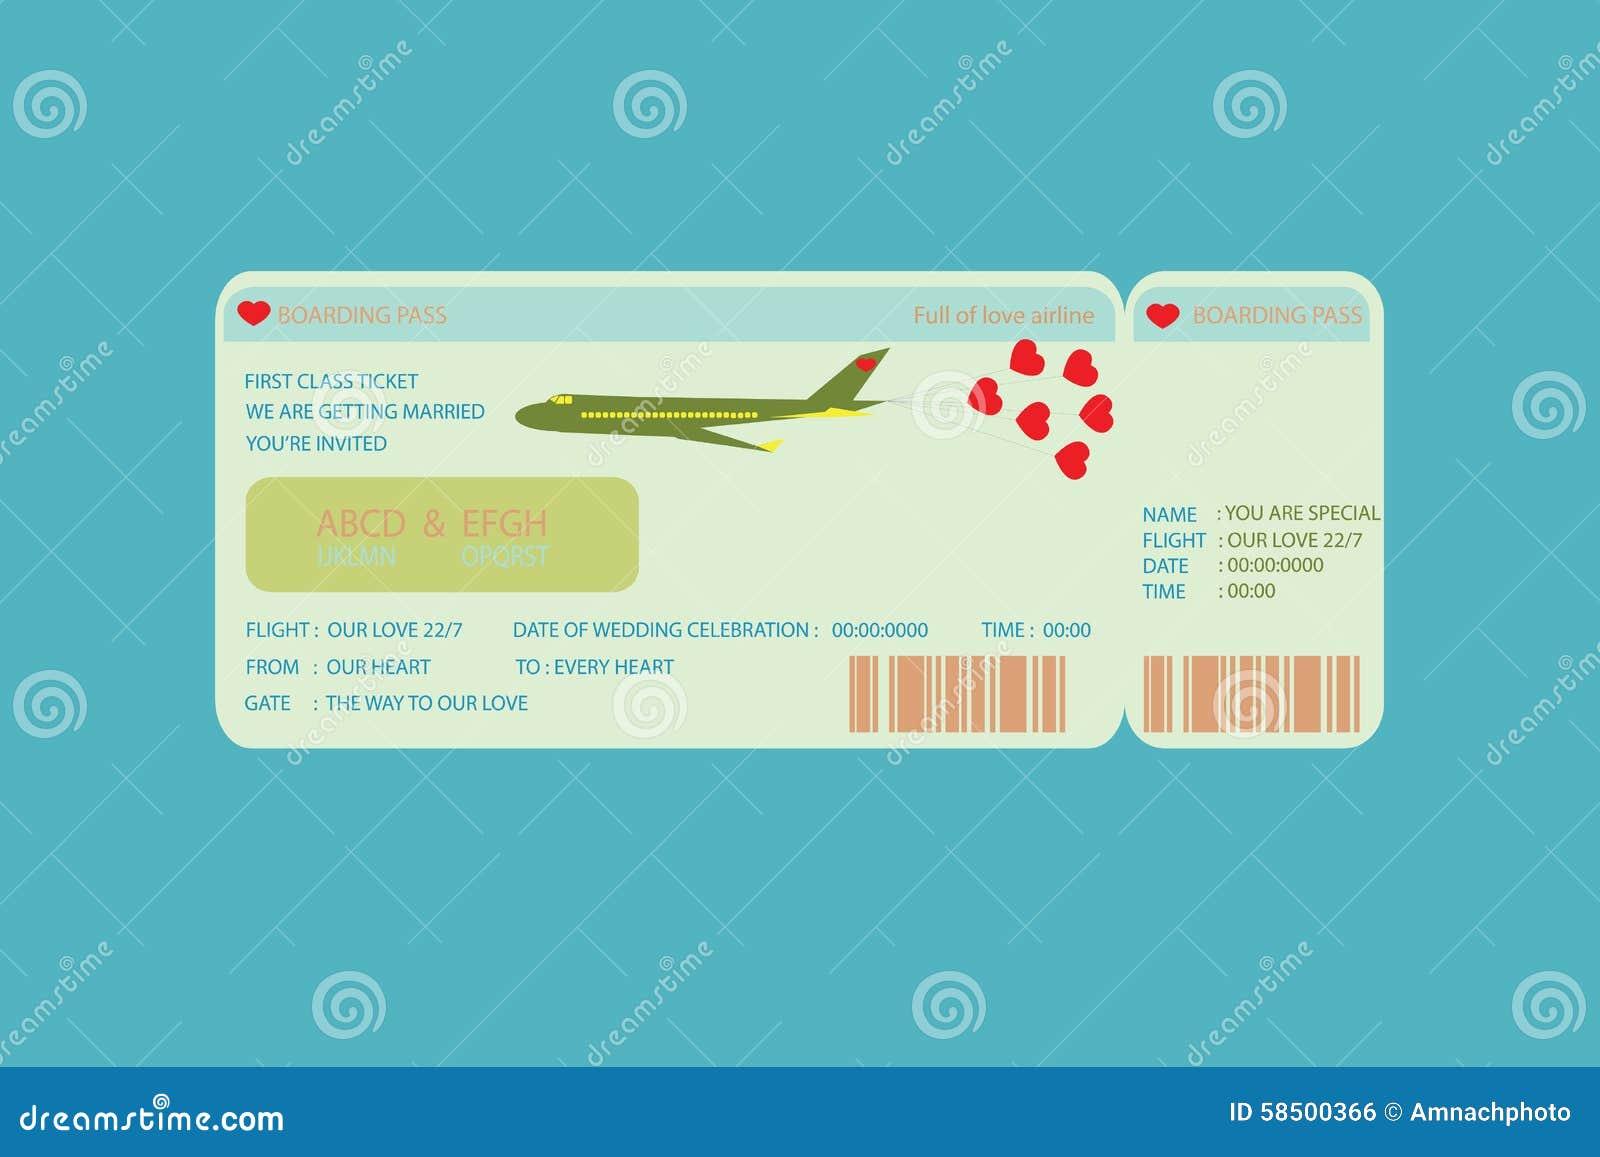 boarding pass ticket  stock vector